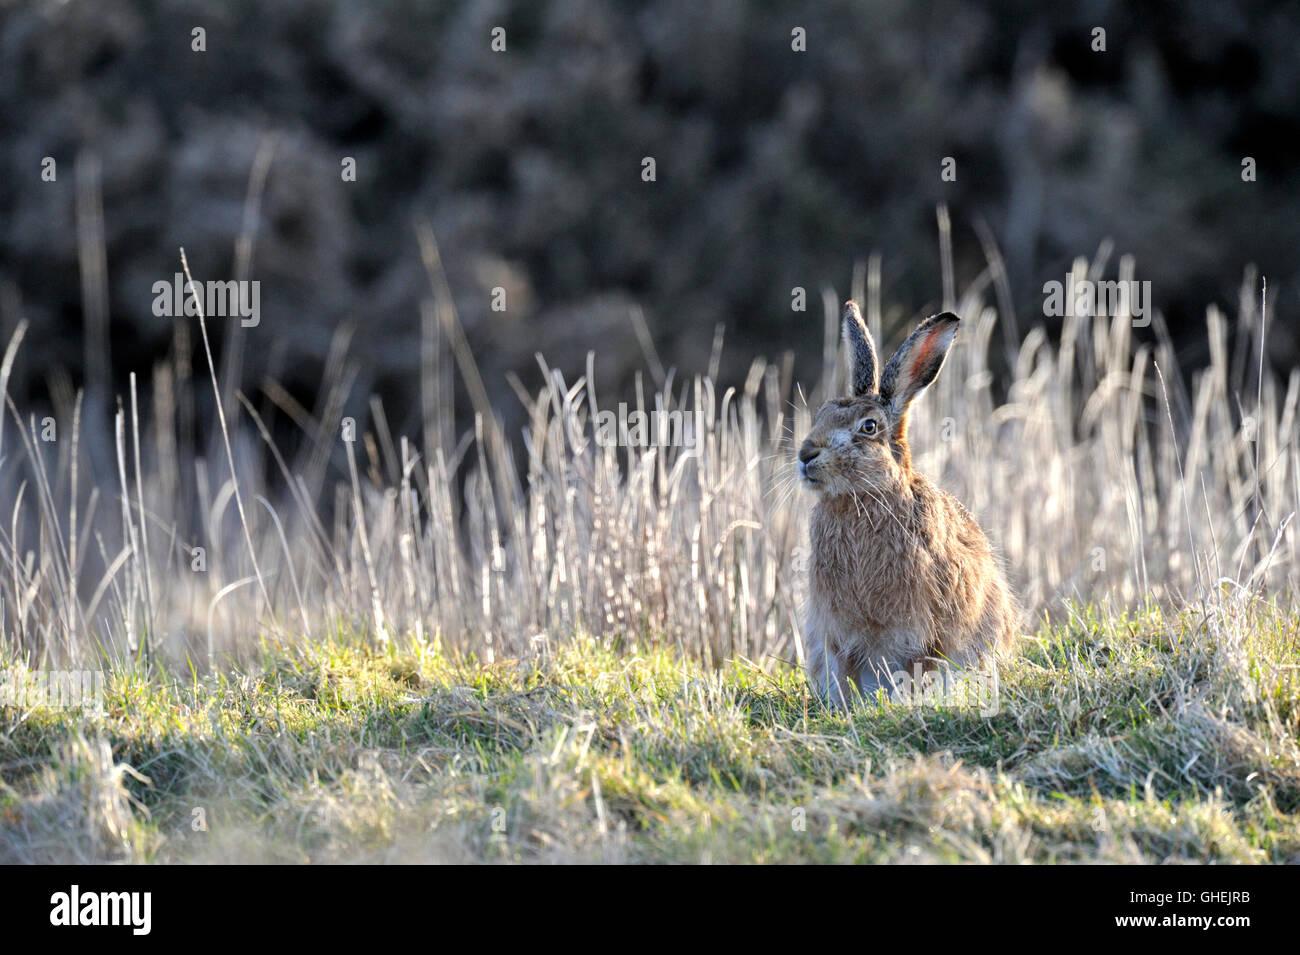 Brown Hare (Lepus europaeus) - UK - Stock Image